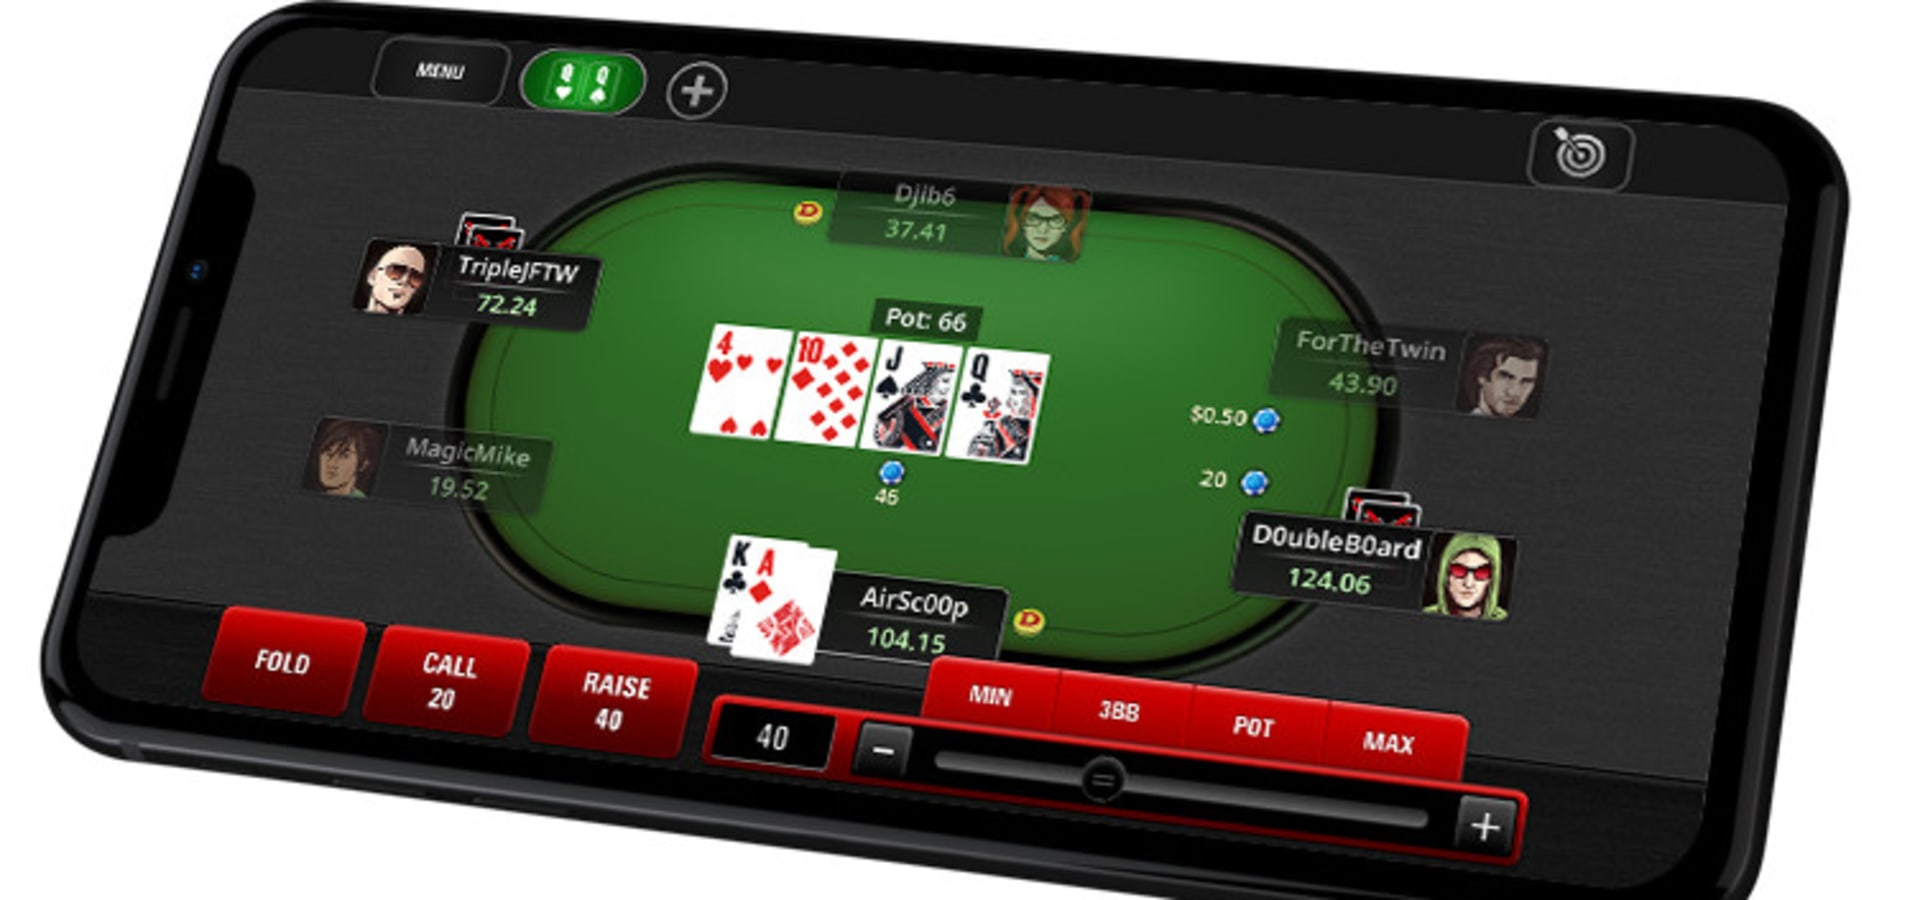 Situs Poker Pkv Games Judi QQ Online Terpercaya 2021   homify